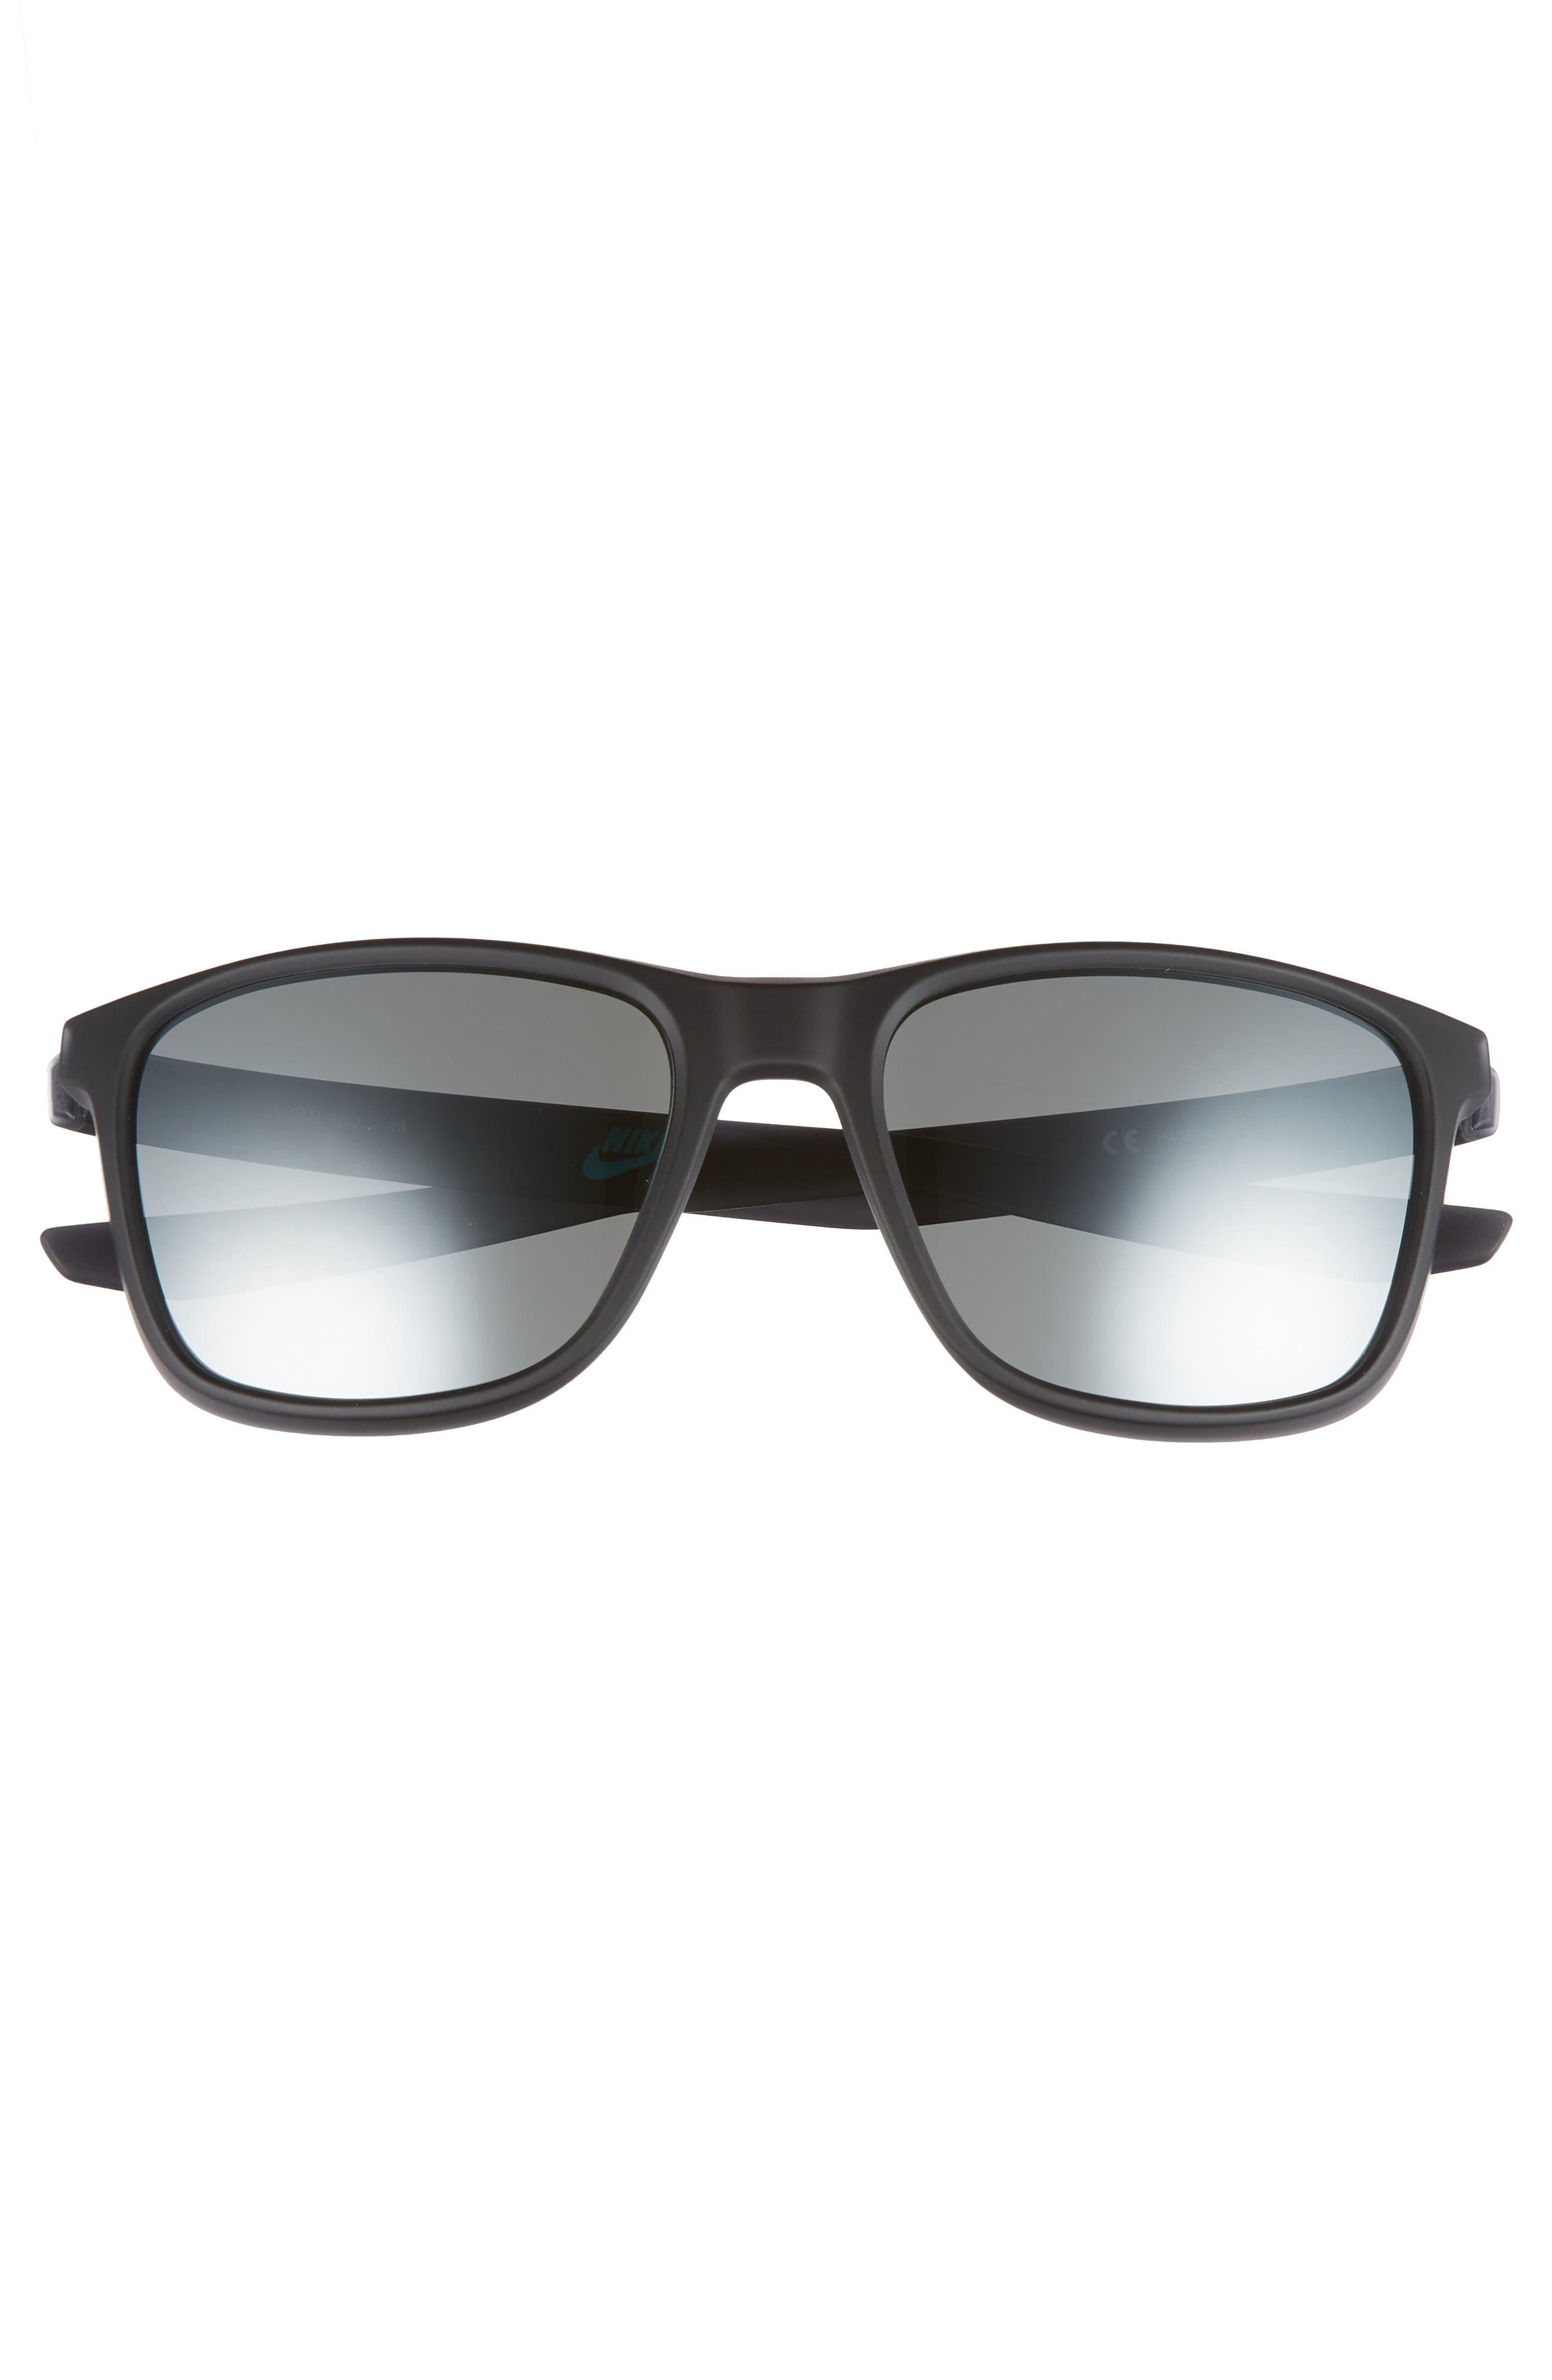 Unrest 57mm Sunglasses,                             Alternate thumbnail 3, color,                             MATTE OBSIDIAN/ GREY SILVER